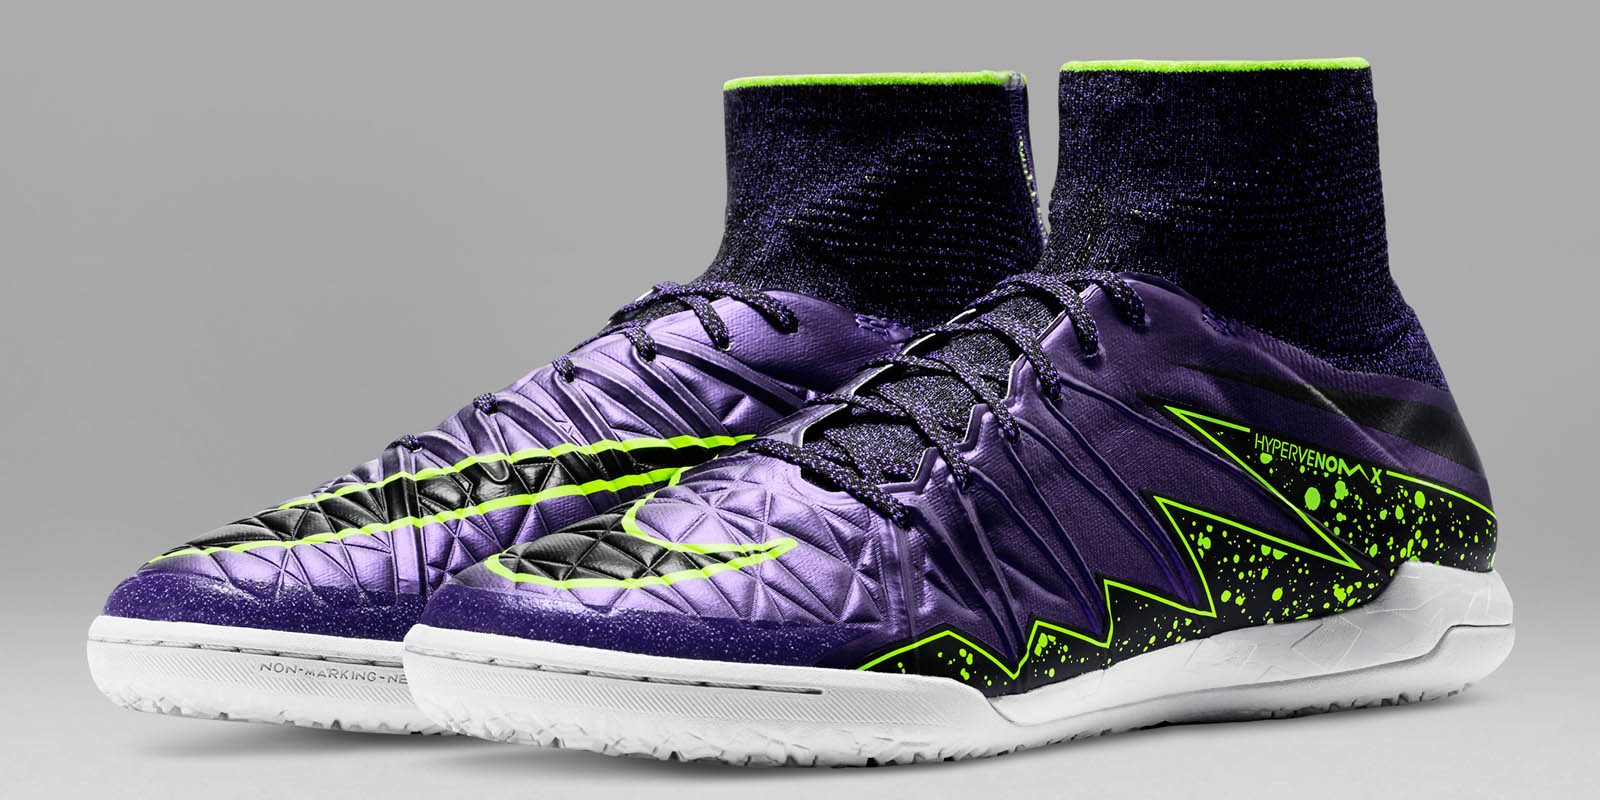 nike dunk anthracite - Purple-Nike-Hypervenom-X-Proximo-2015-Boots (1).jpg